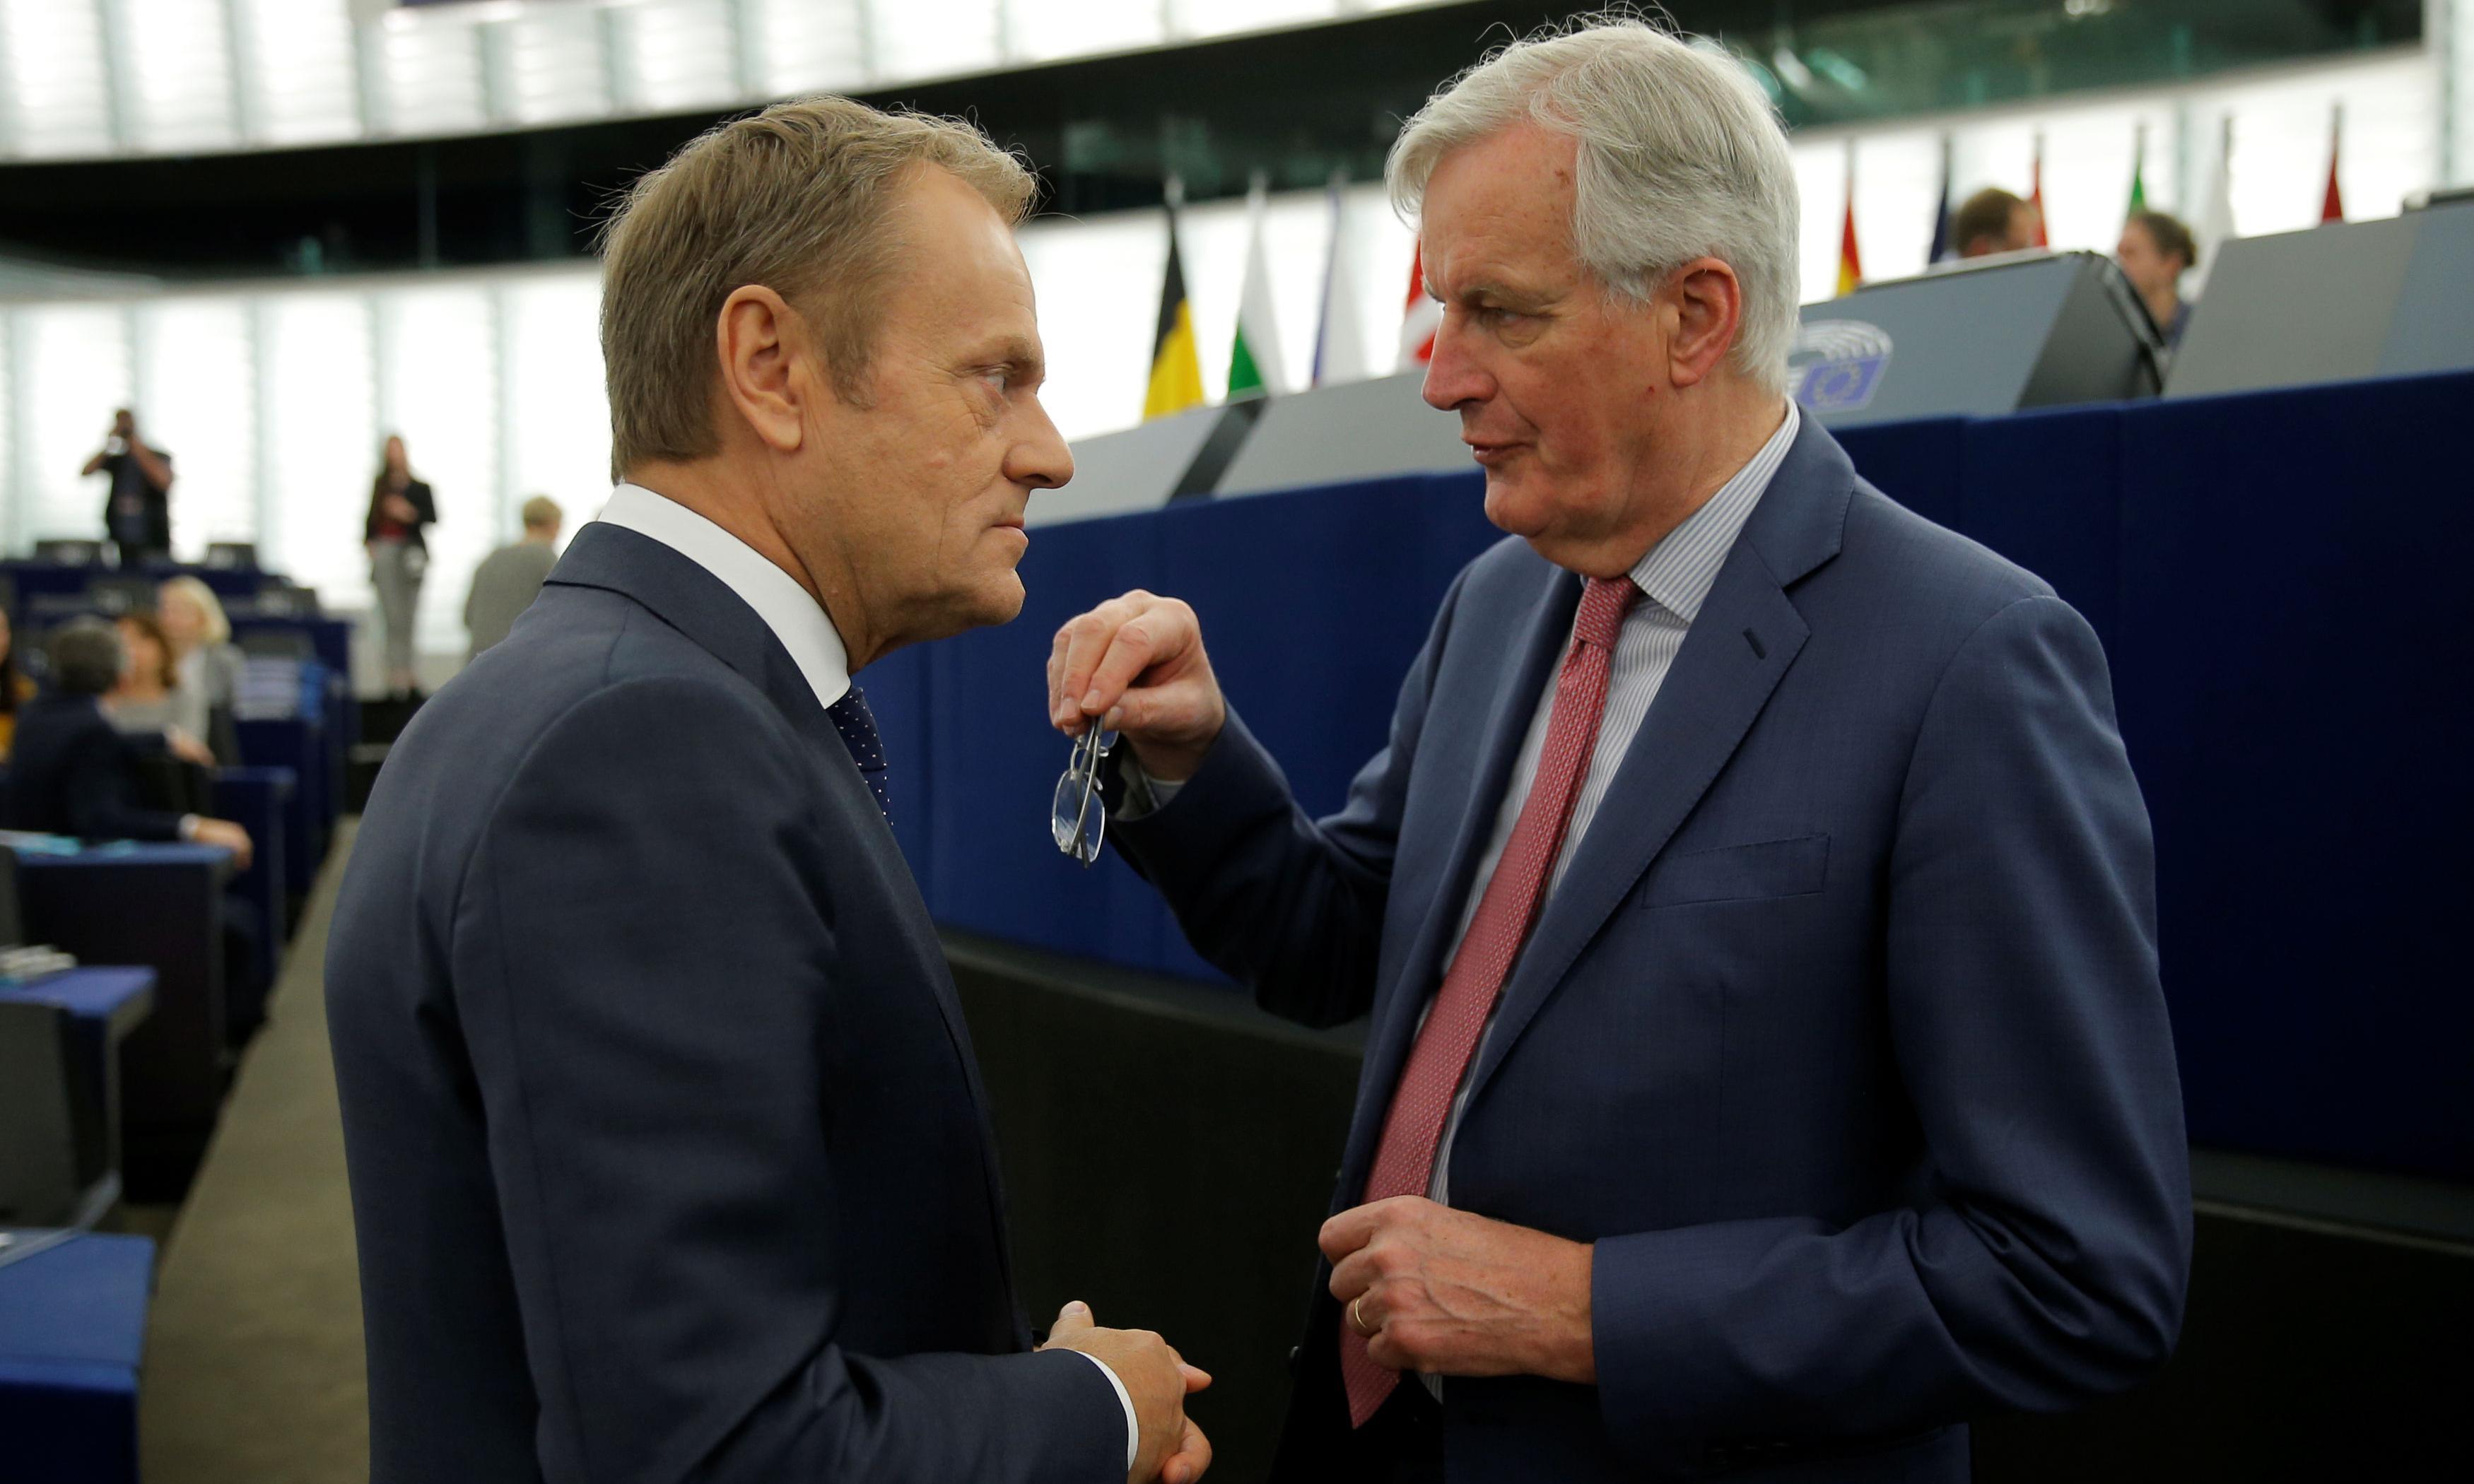 Donald Tusk indicates EU would grant Brexit extension